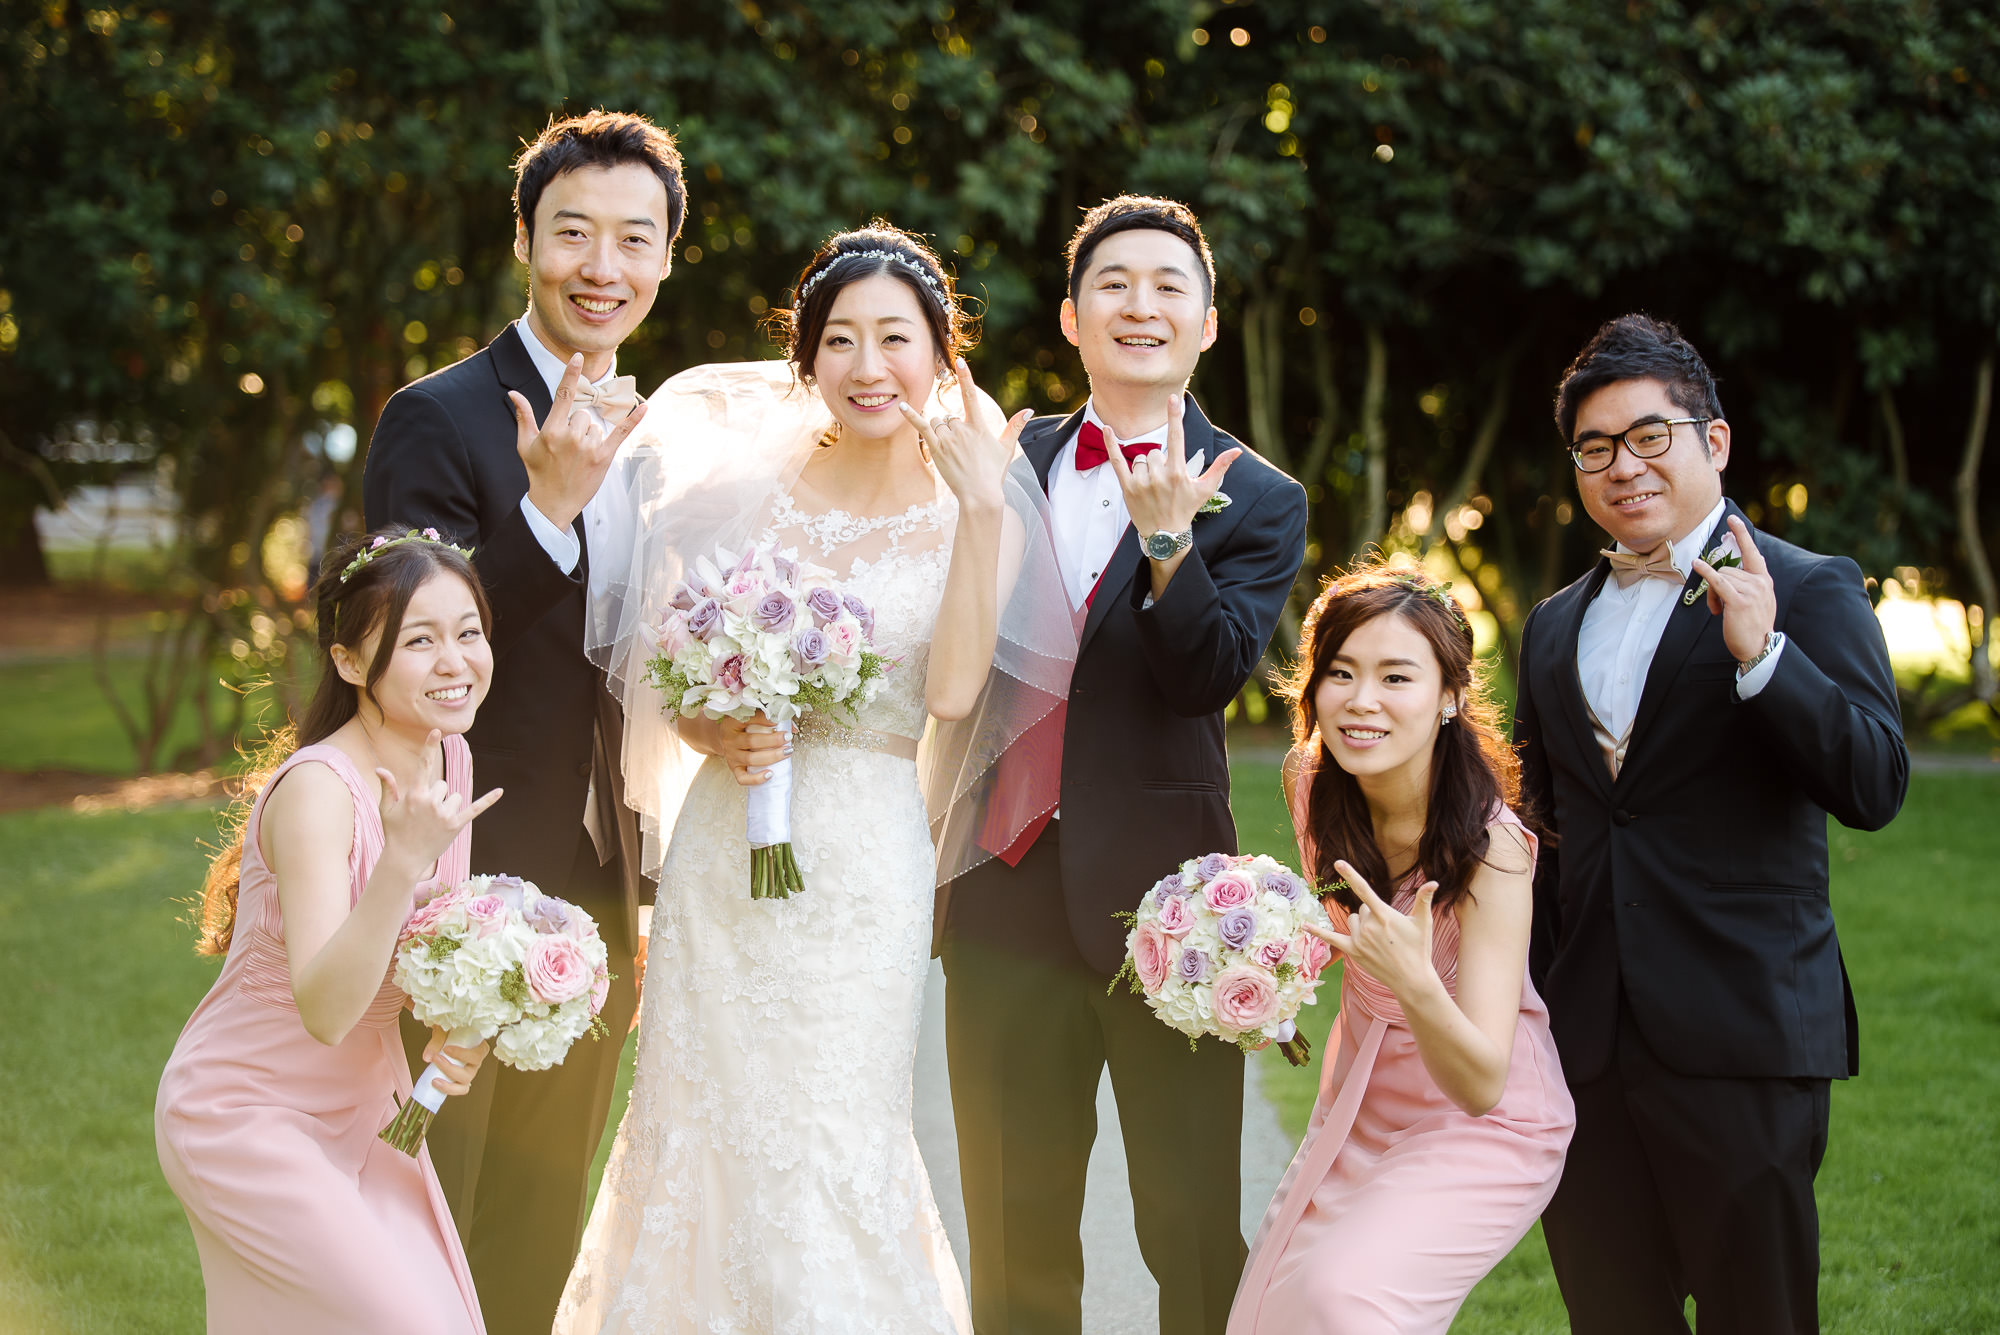 minoru_chapel_richmond_wedding_ceremony 17045119.jpg